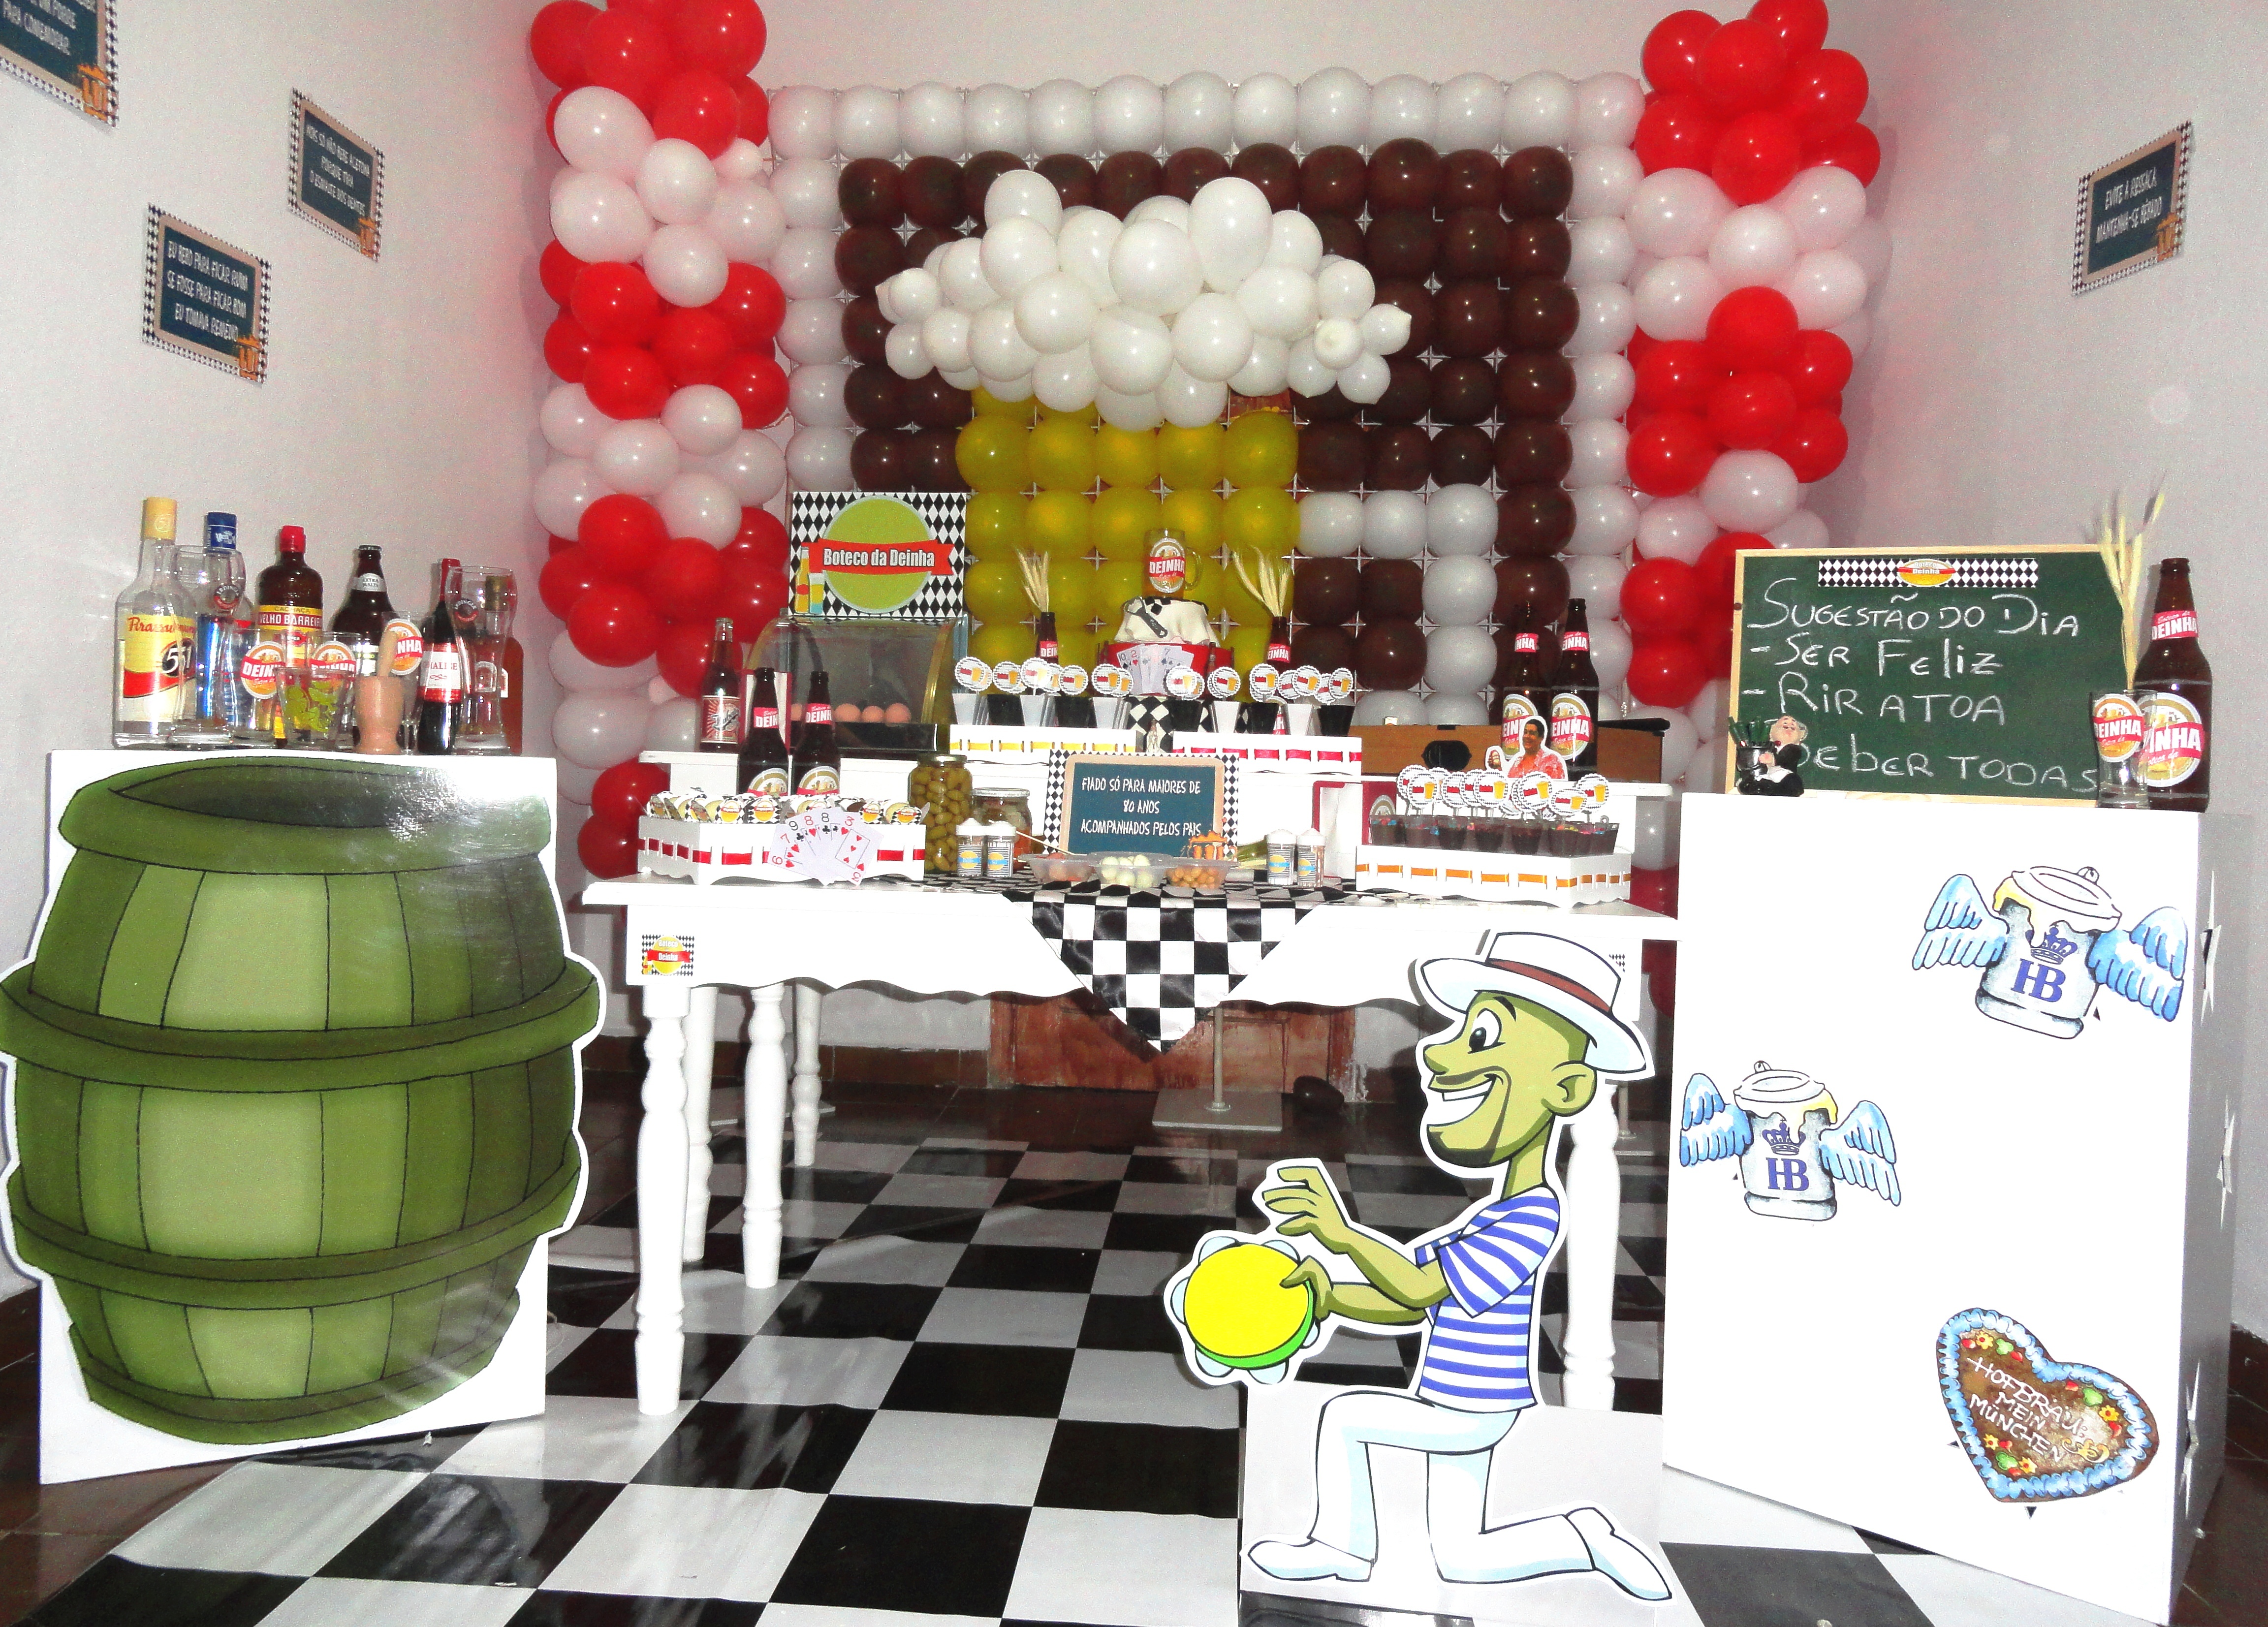 decoracao de mesa boteco : decoracao de mesa boteco:decoracao-boteco-boteco